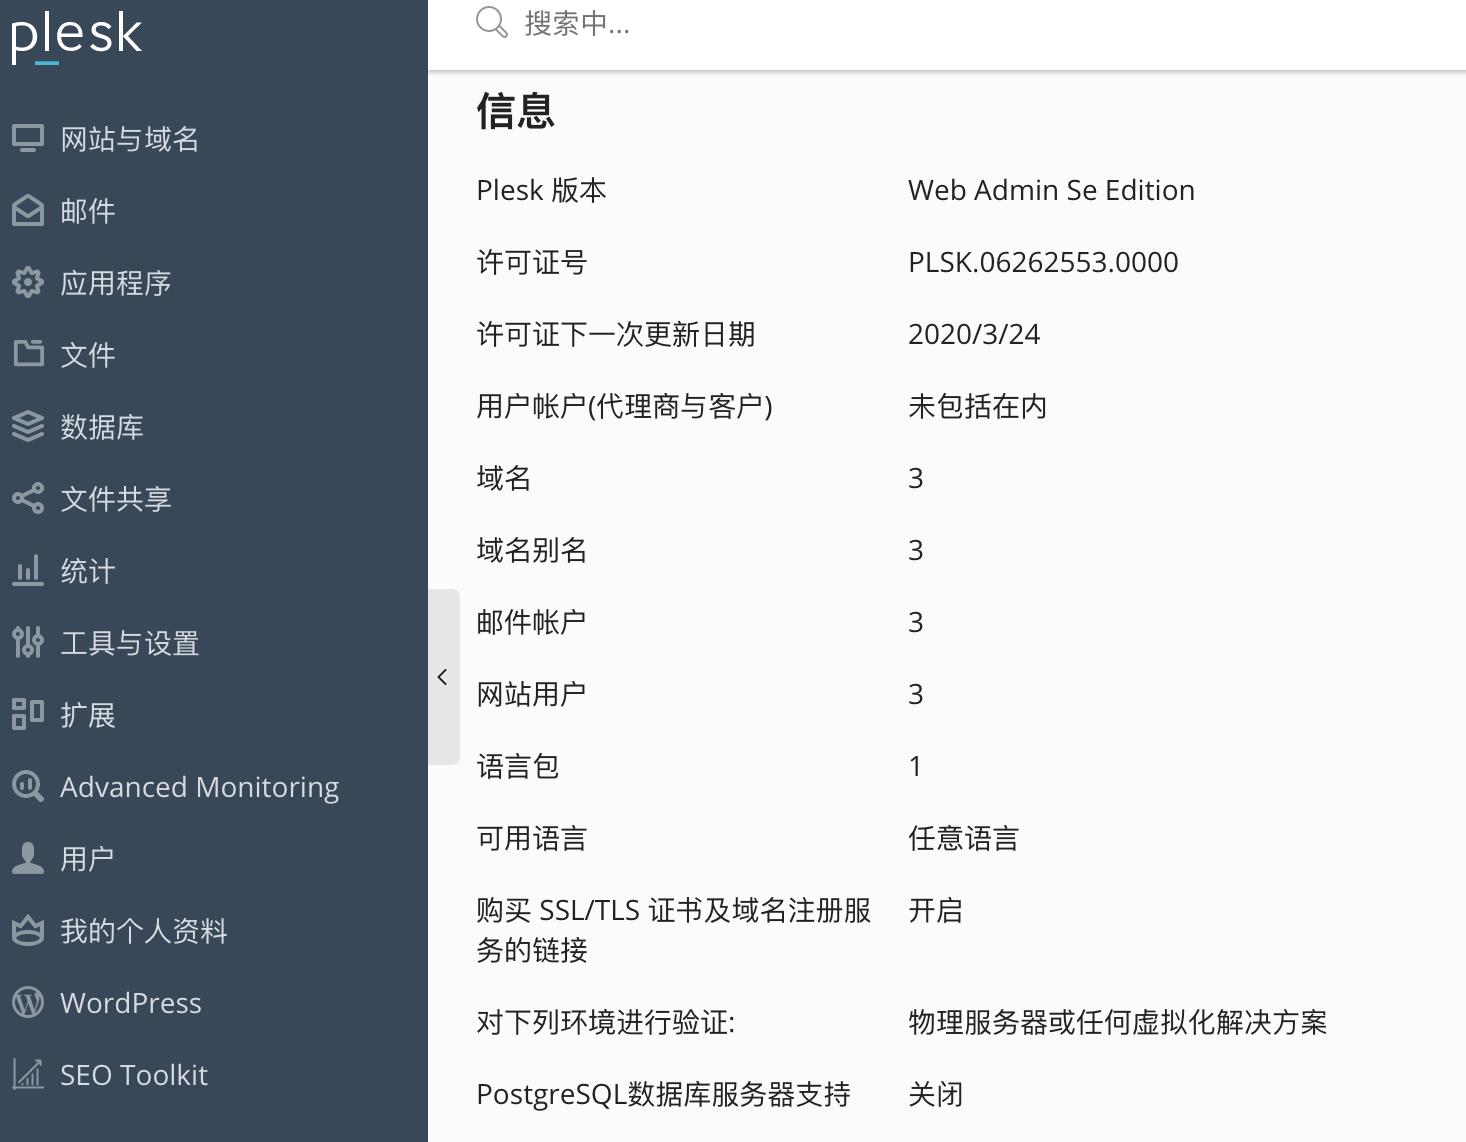 Vultr 免费的 Plesk Web Admin Se Edition